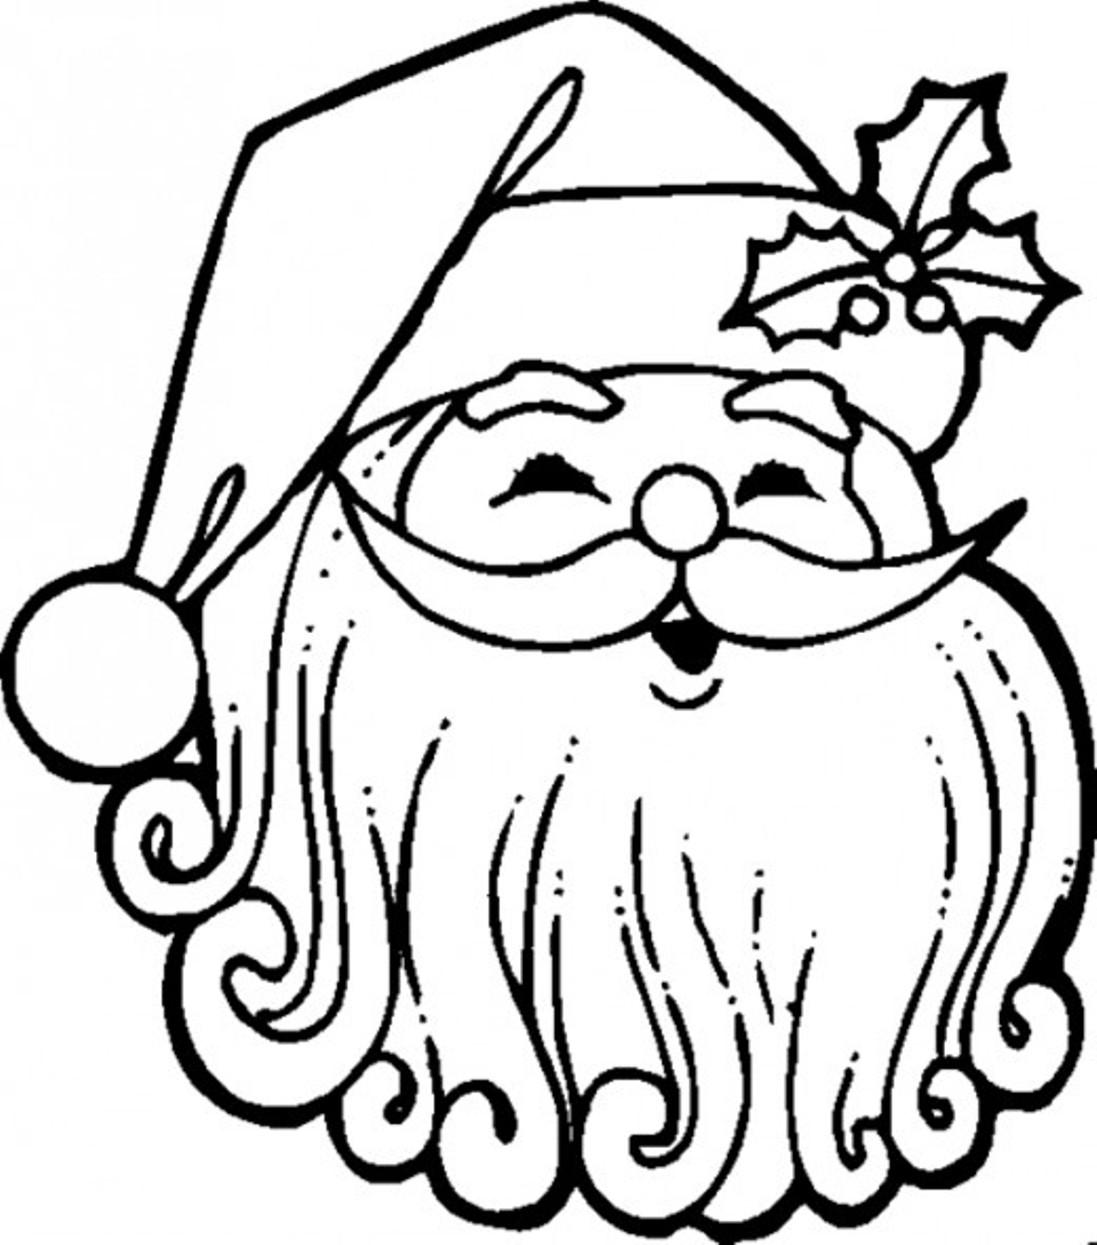 1097x1245 Santa Claus Face Coloring Pages